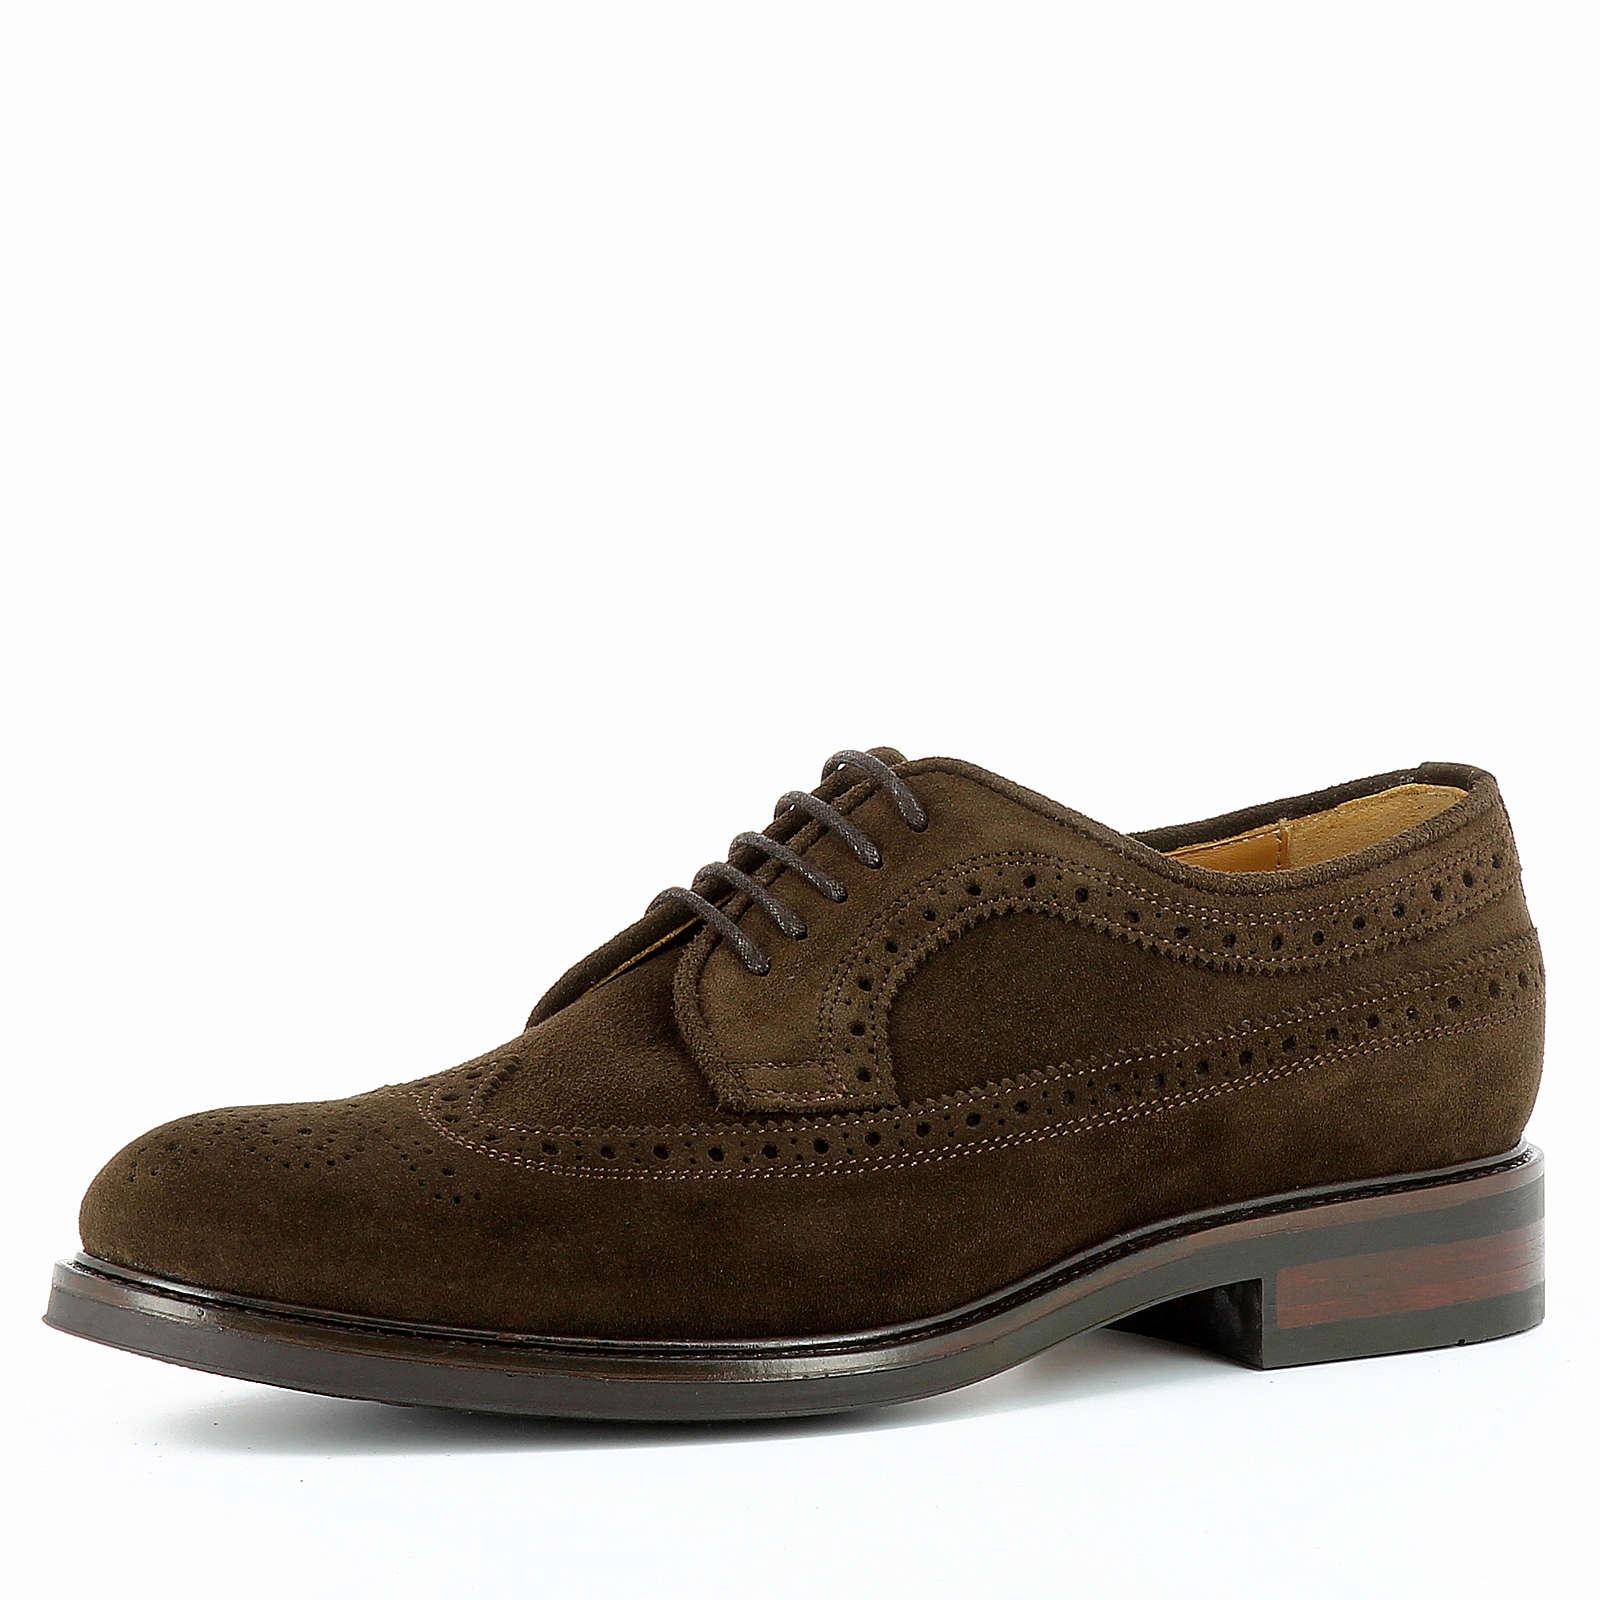 Evita Shoes Halbschuhe ADRIANO dunkelbraun Herren Gr. 44